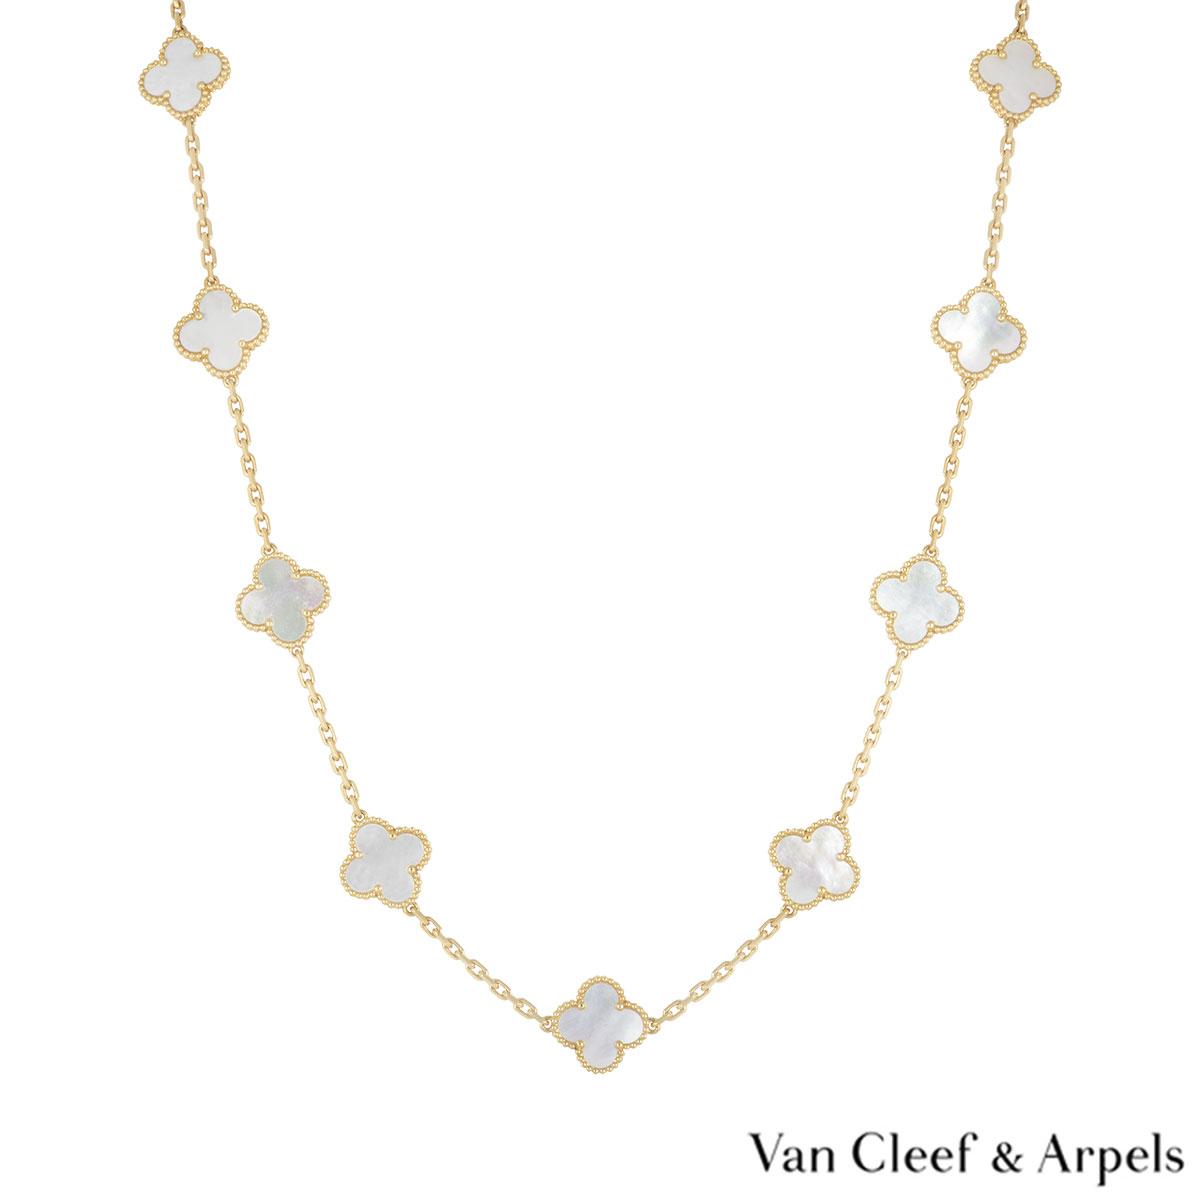 Van Cleef & Arpels Yellow Gold Vintage Alhambra Necklace VCARA42100